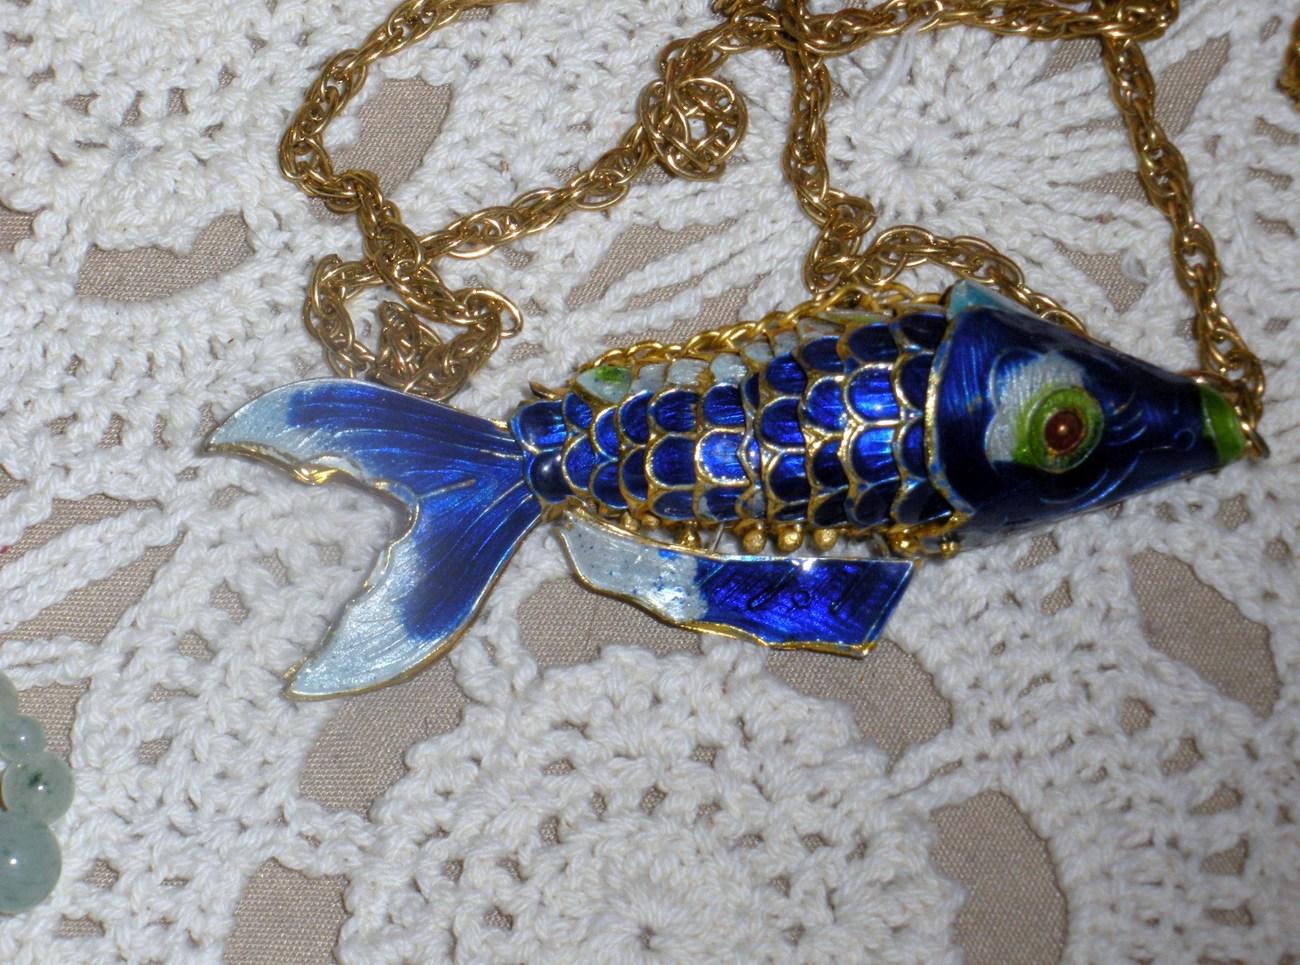 Cloisonne koi fish pendant chain necklace blue orange for Blue and orange koi fish